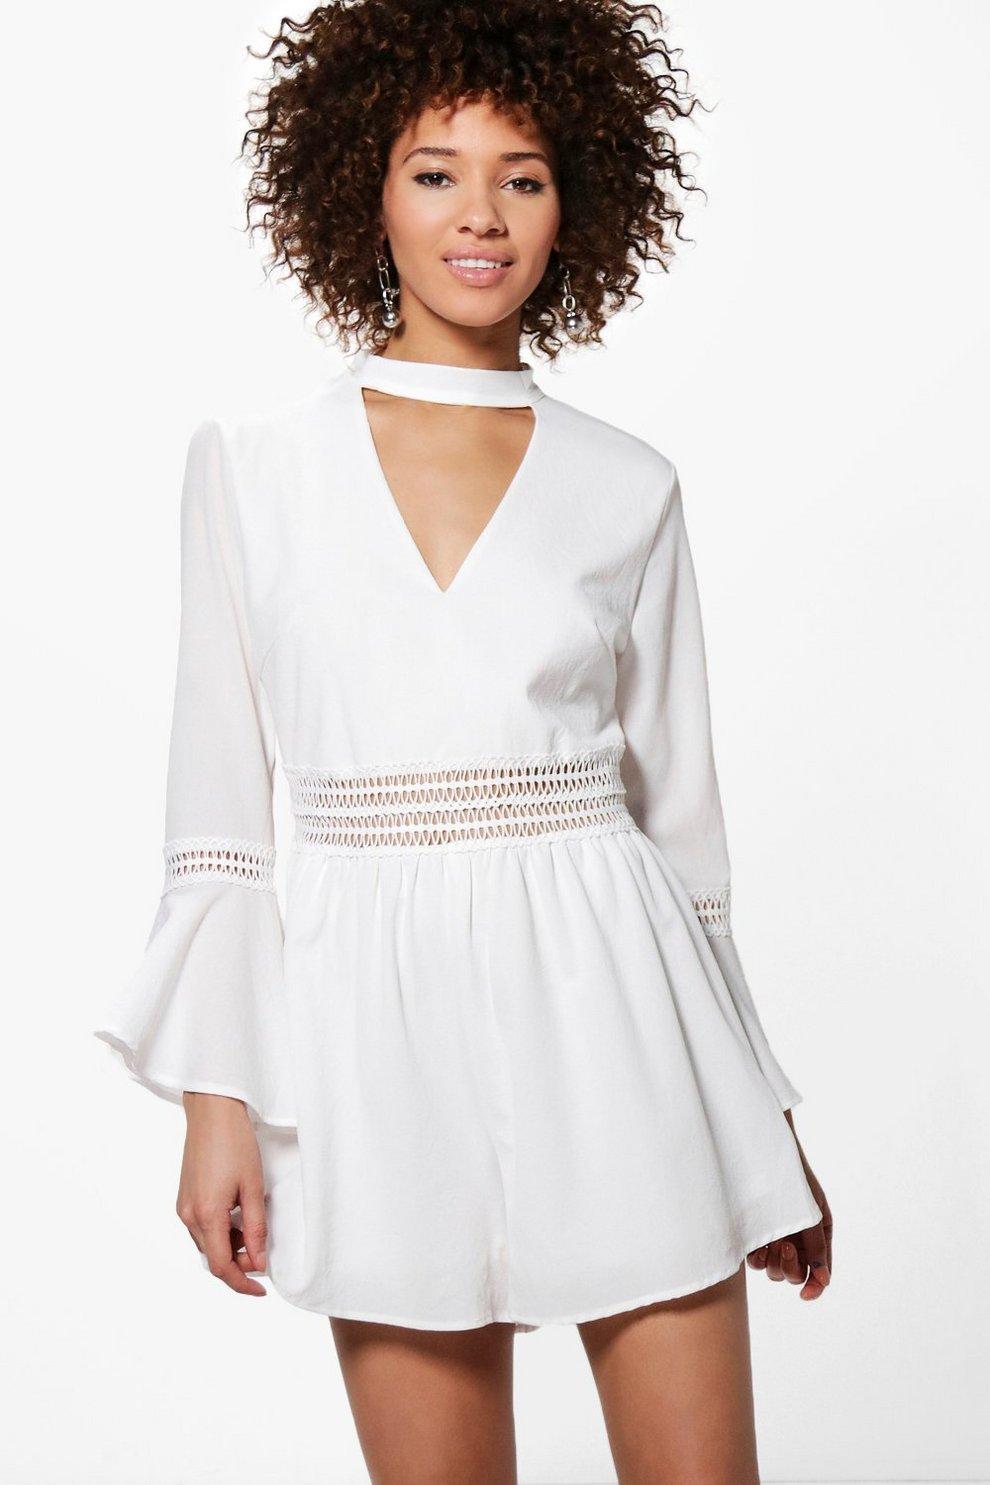 d34c0598dd64f Womens White Jen Crochet Trim Flare Sleeve Choker Playsuit